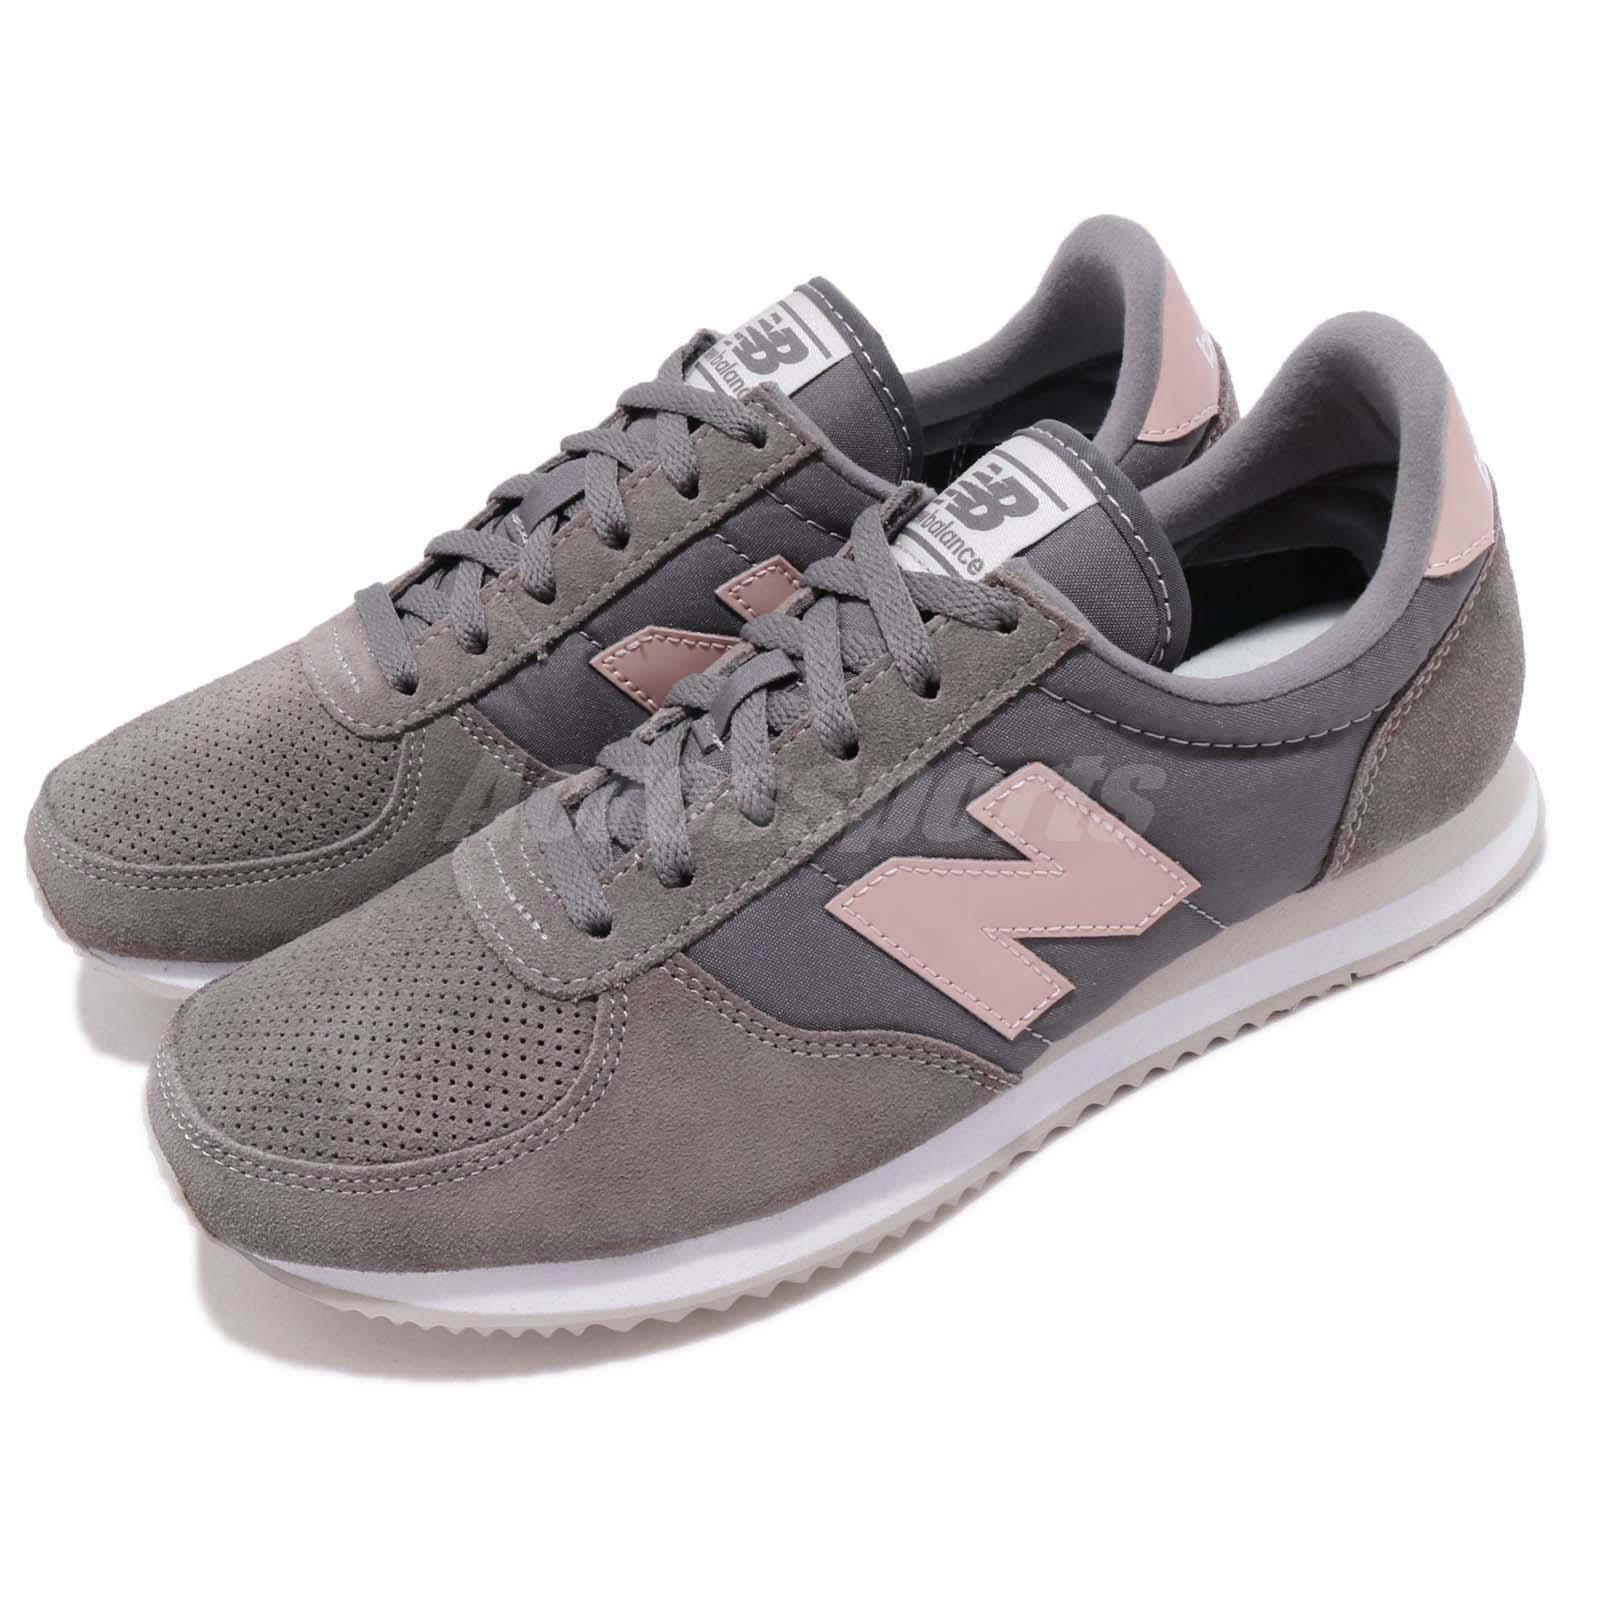 New Balance WL220TG B Grey Pink White Women Running shoes Sneakers WL220TGB